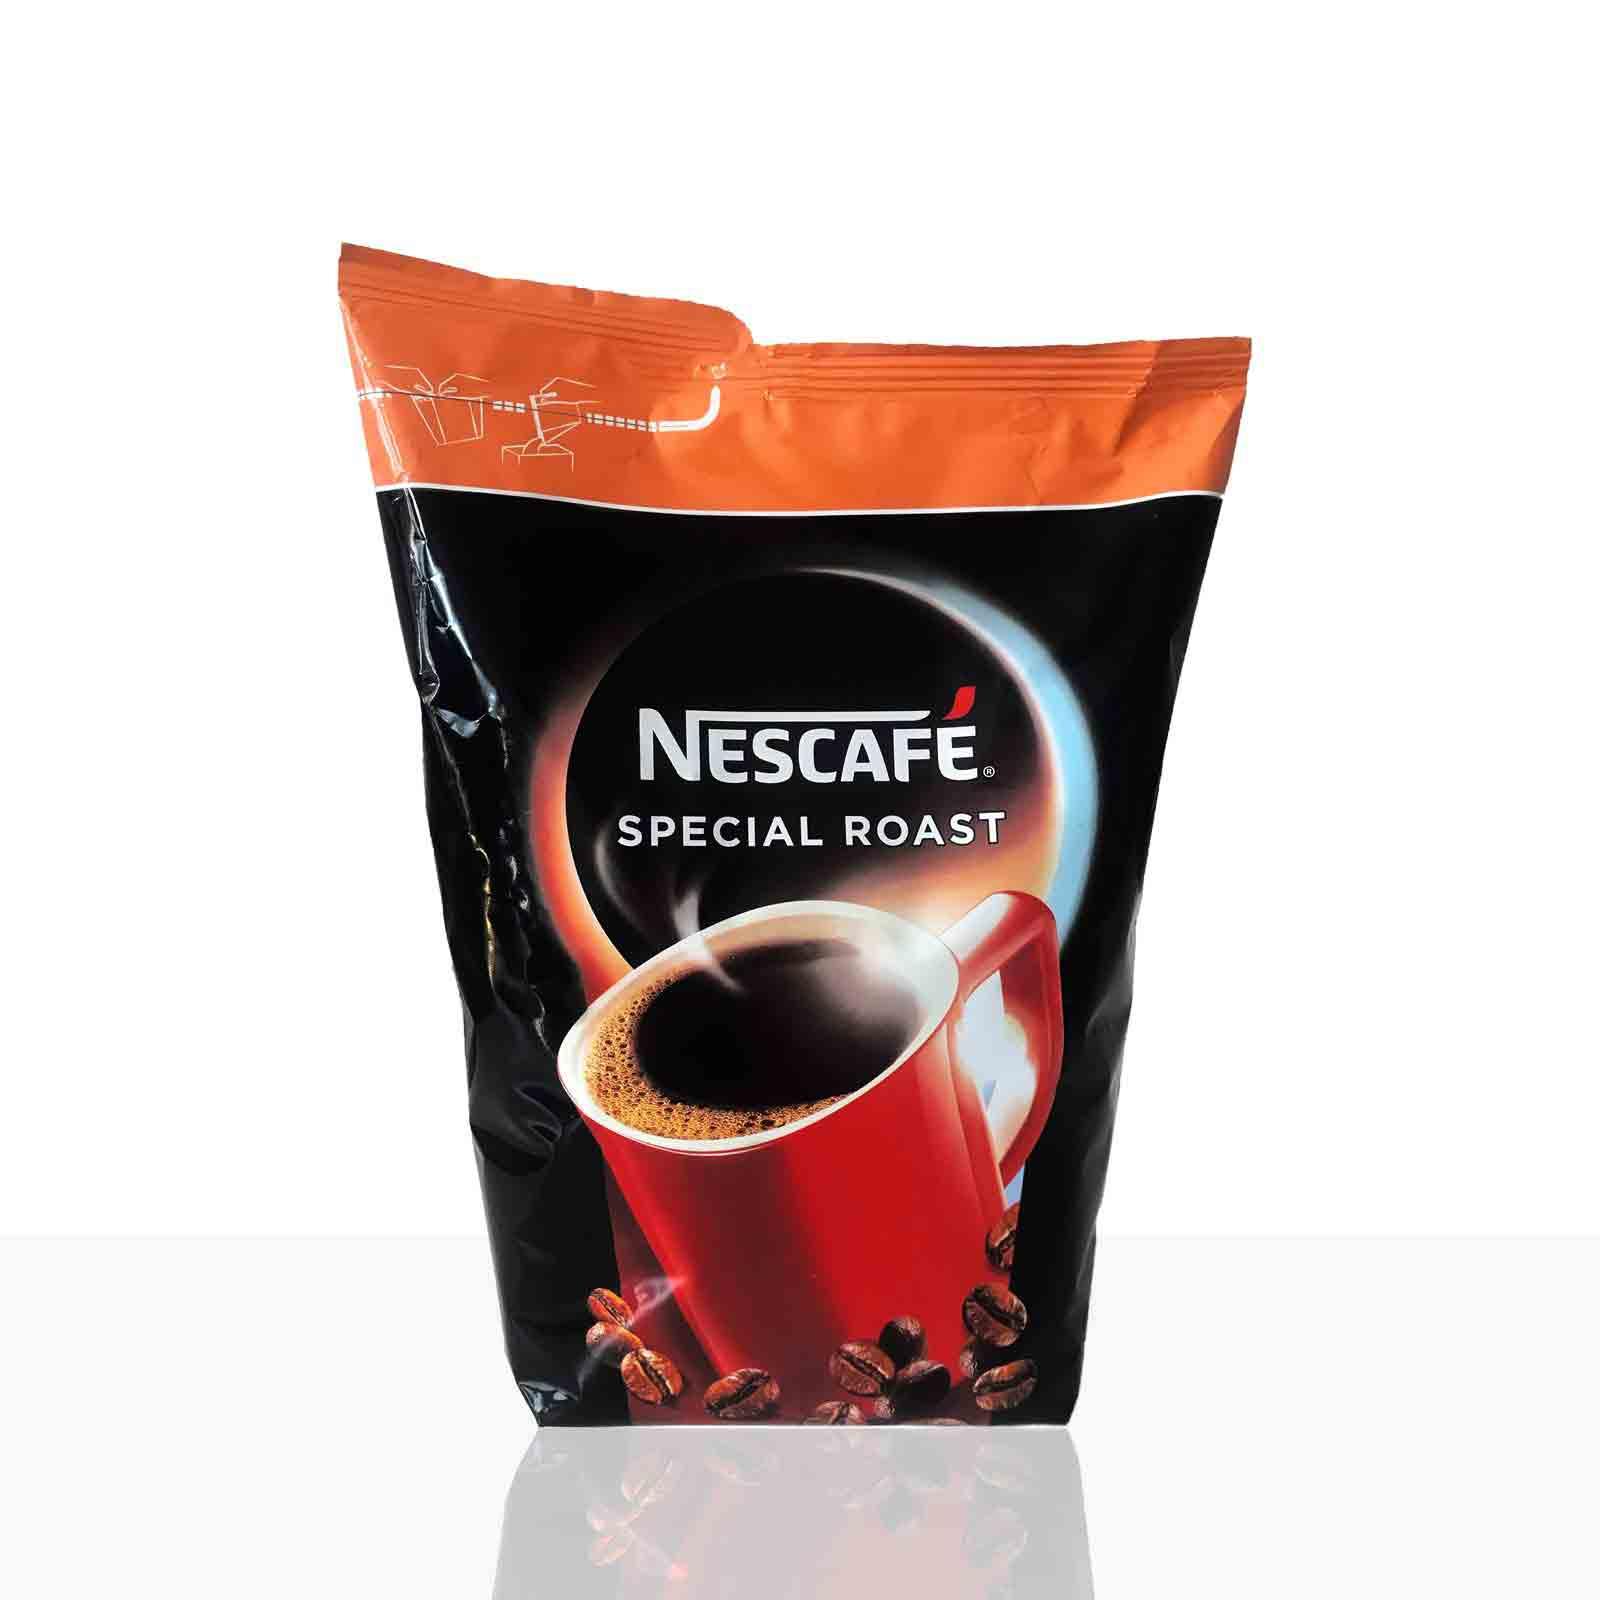 Nestle Nescafe Special Roast 12 x 500g Instant-Kaffee